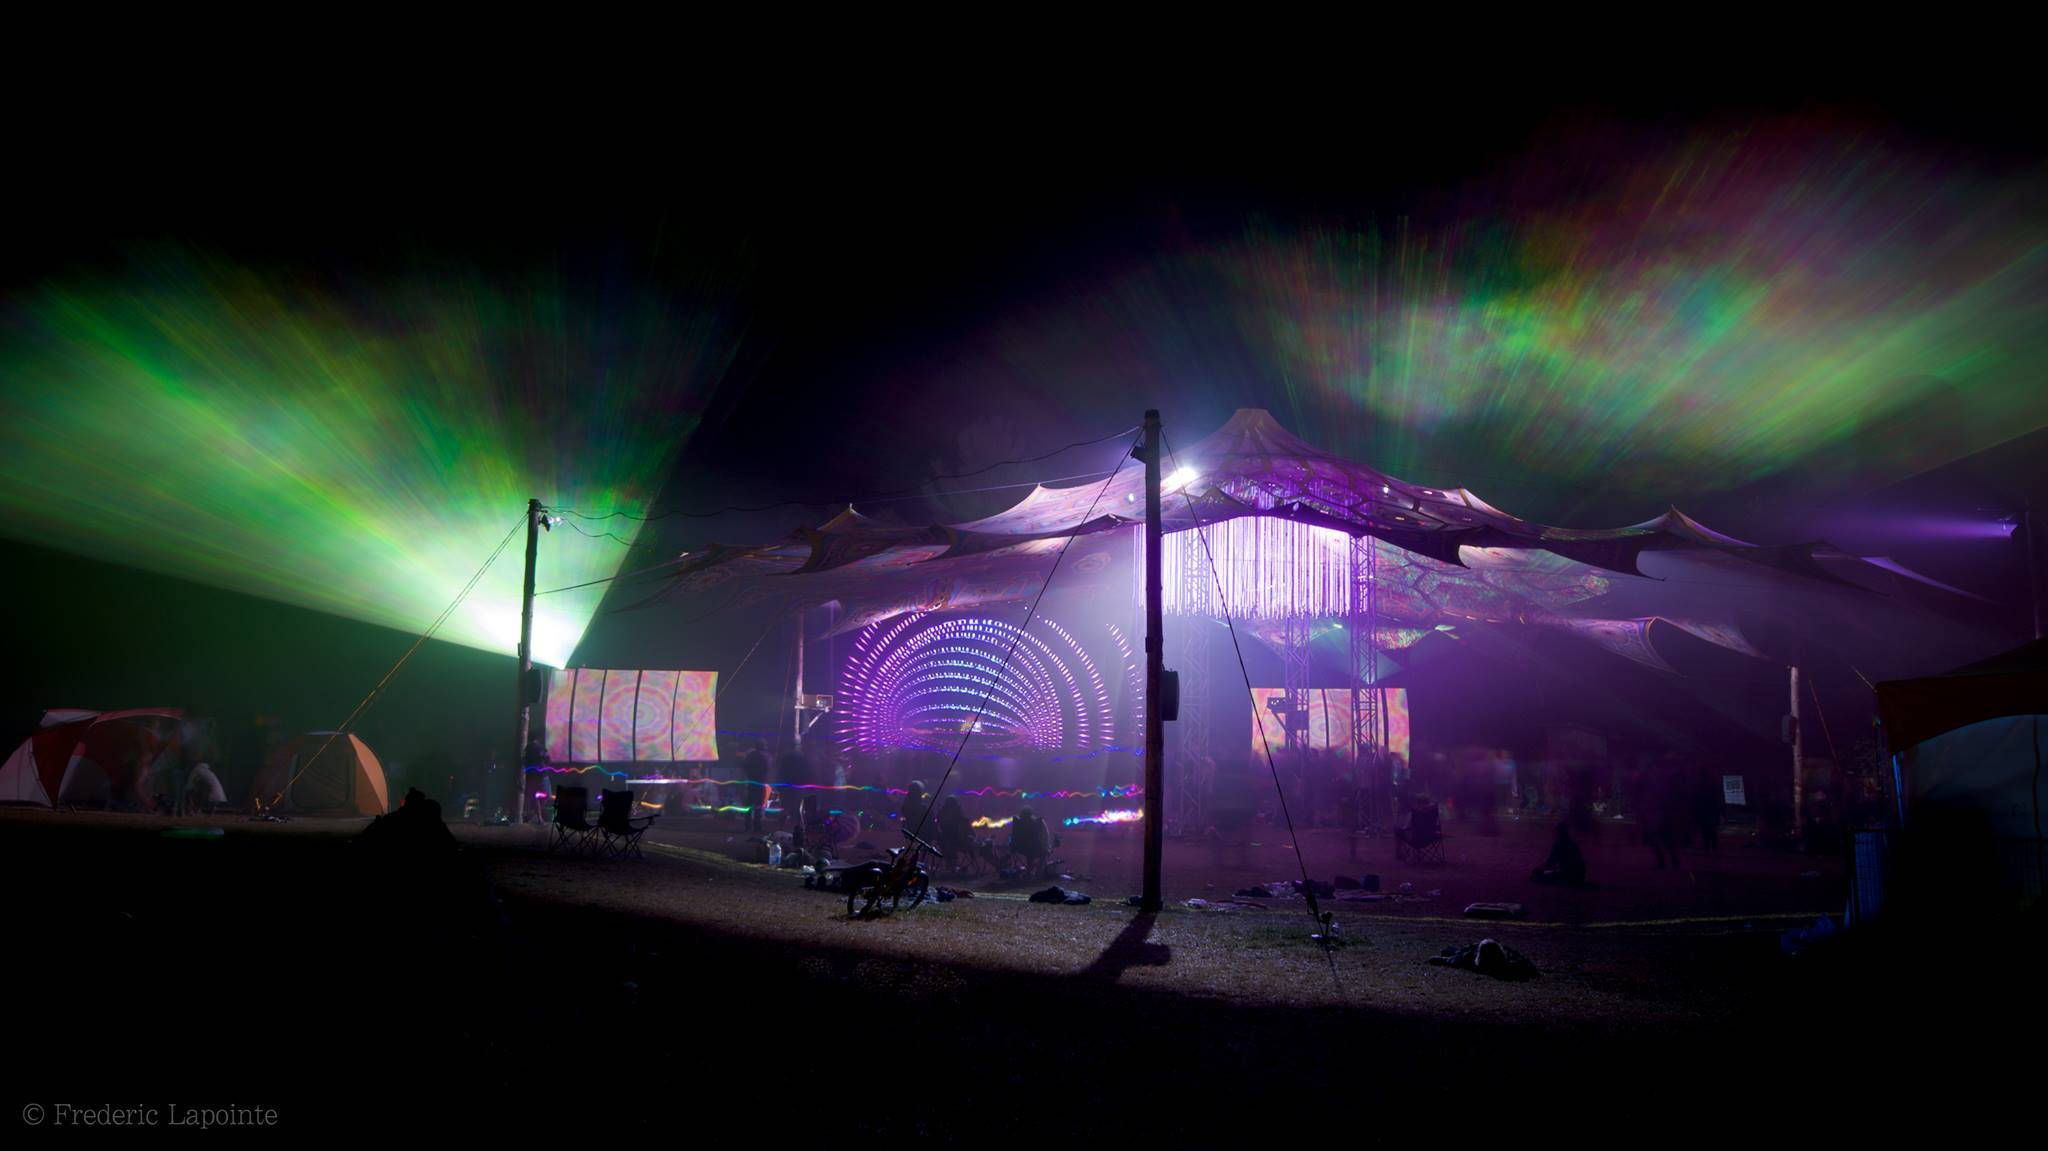 Eclipse festival 2016 dancefloor at night